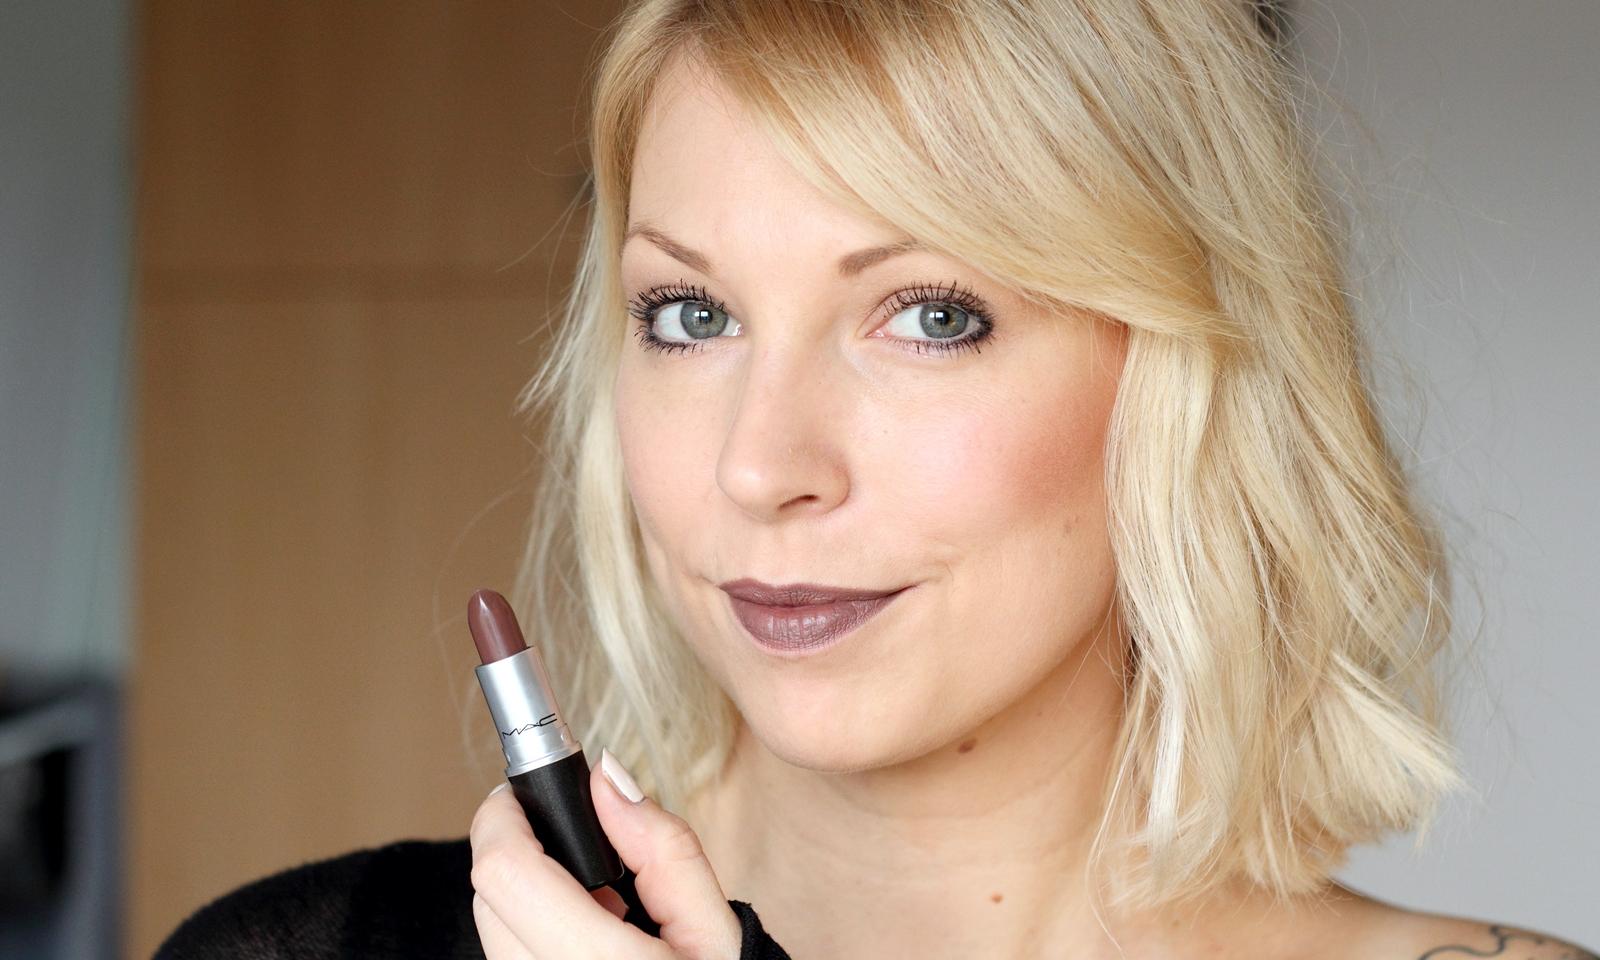 beautyblogger karlsruhe mac lippenstift lipstick stone swatch 4 lavie deboite. Black Bedroom Furniture Sets. Home Design Ideas